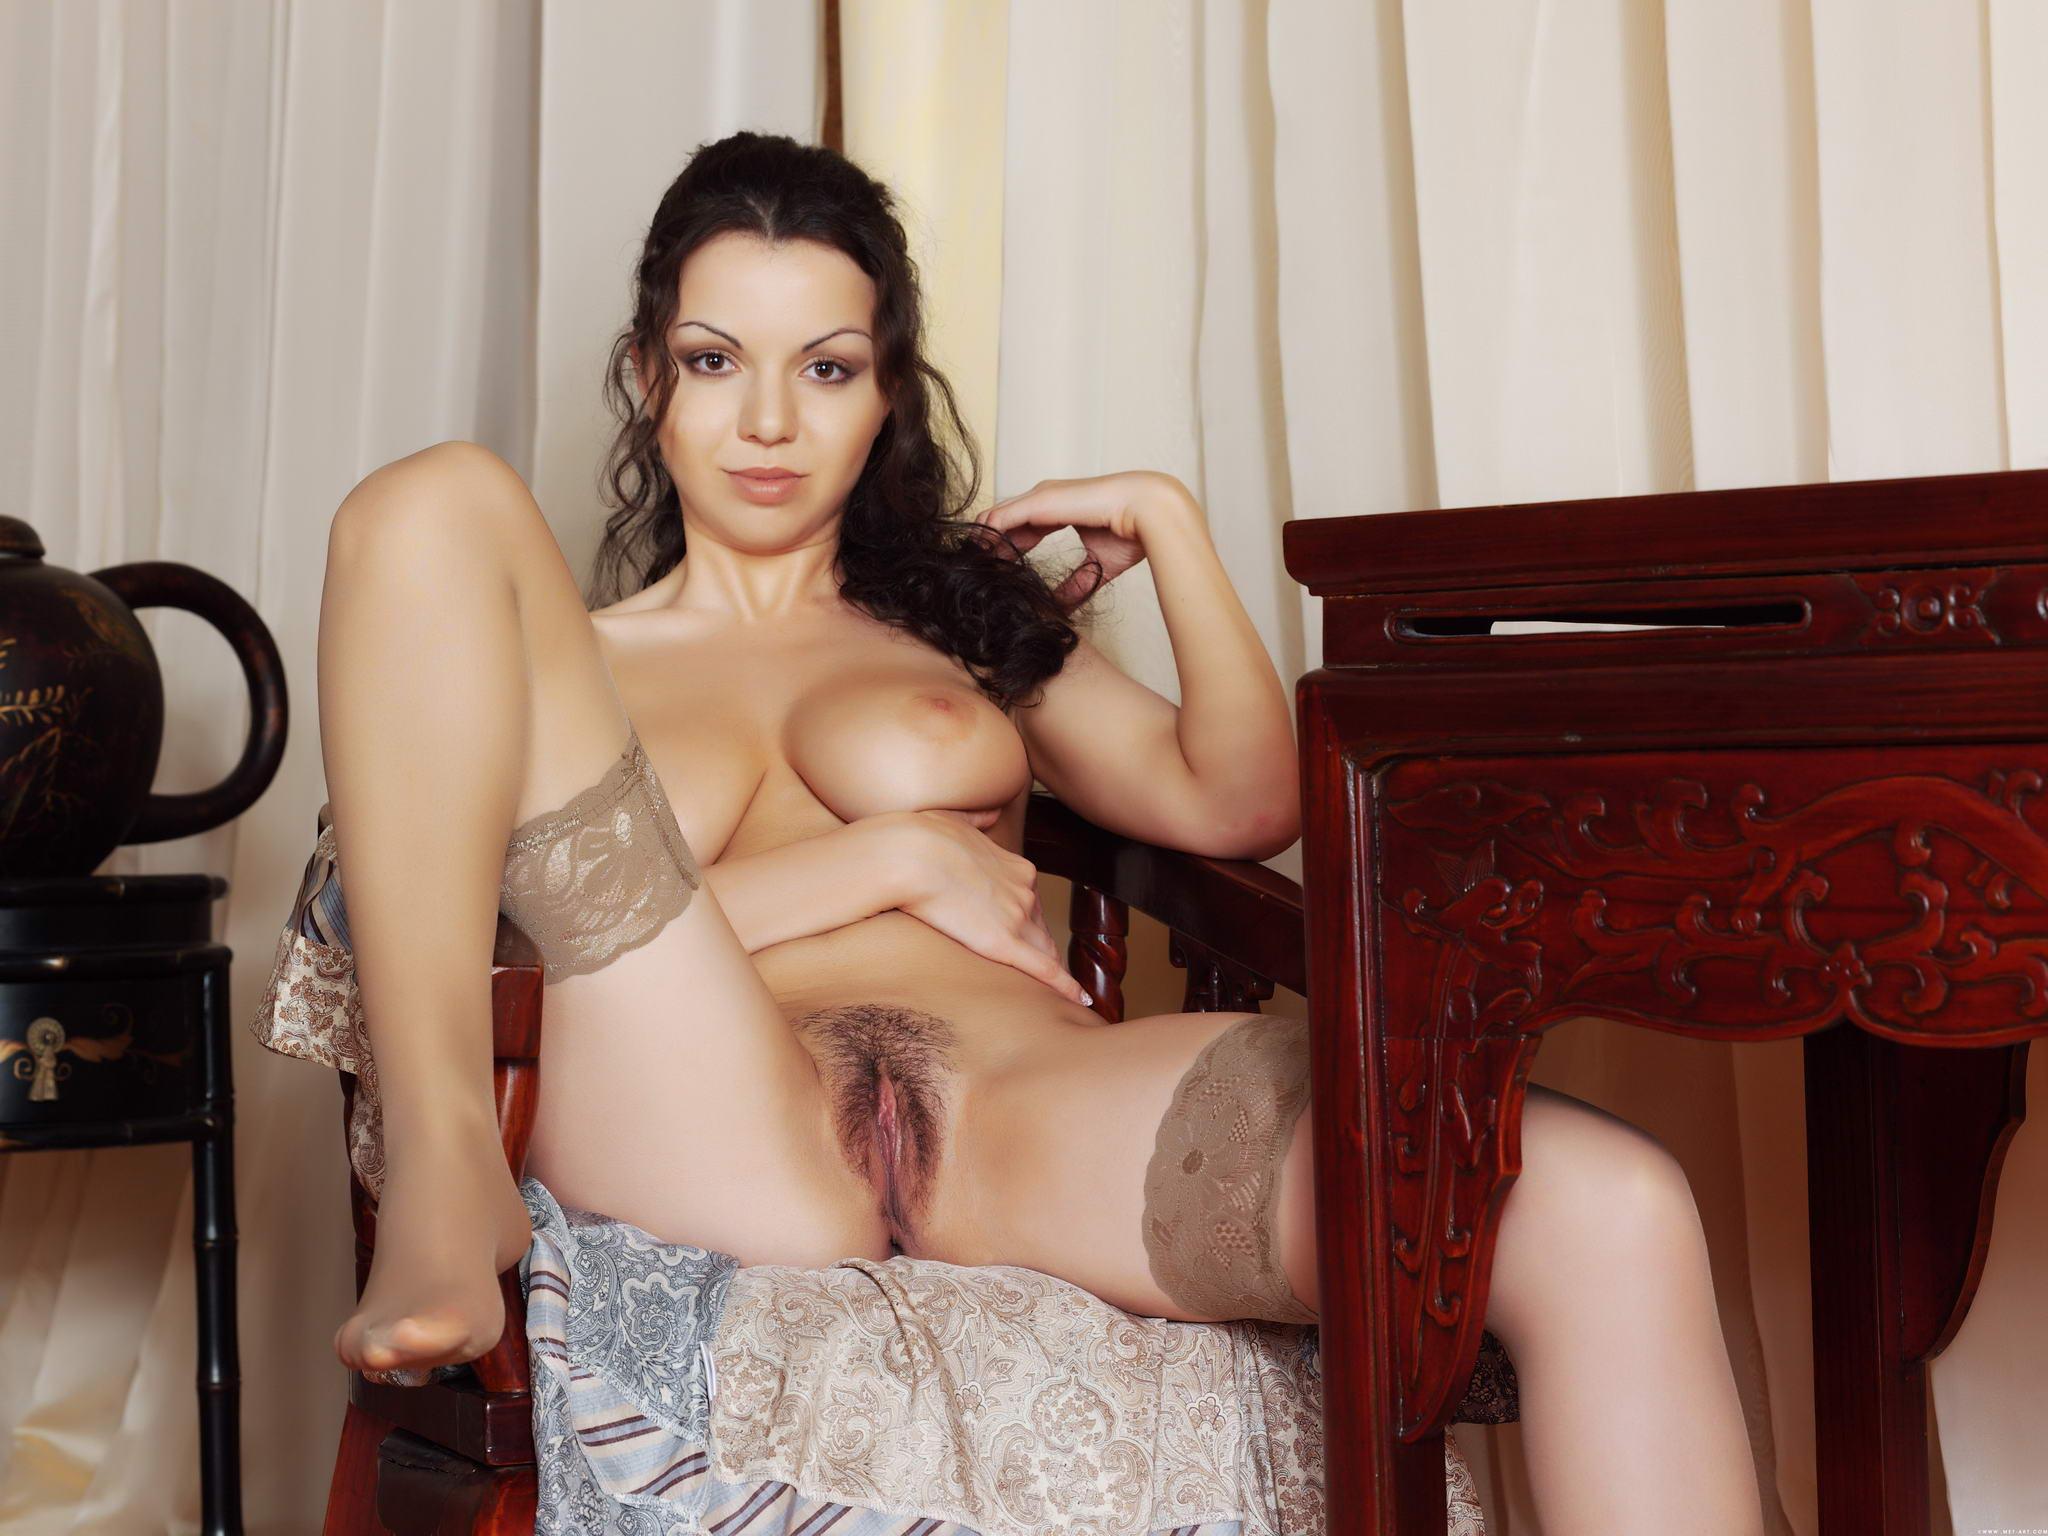 Порно брюнетки фото чулки 28 фотография